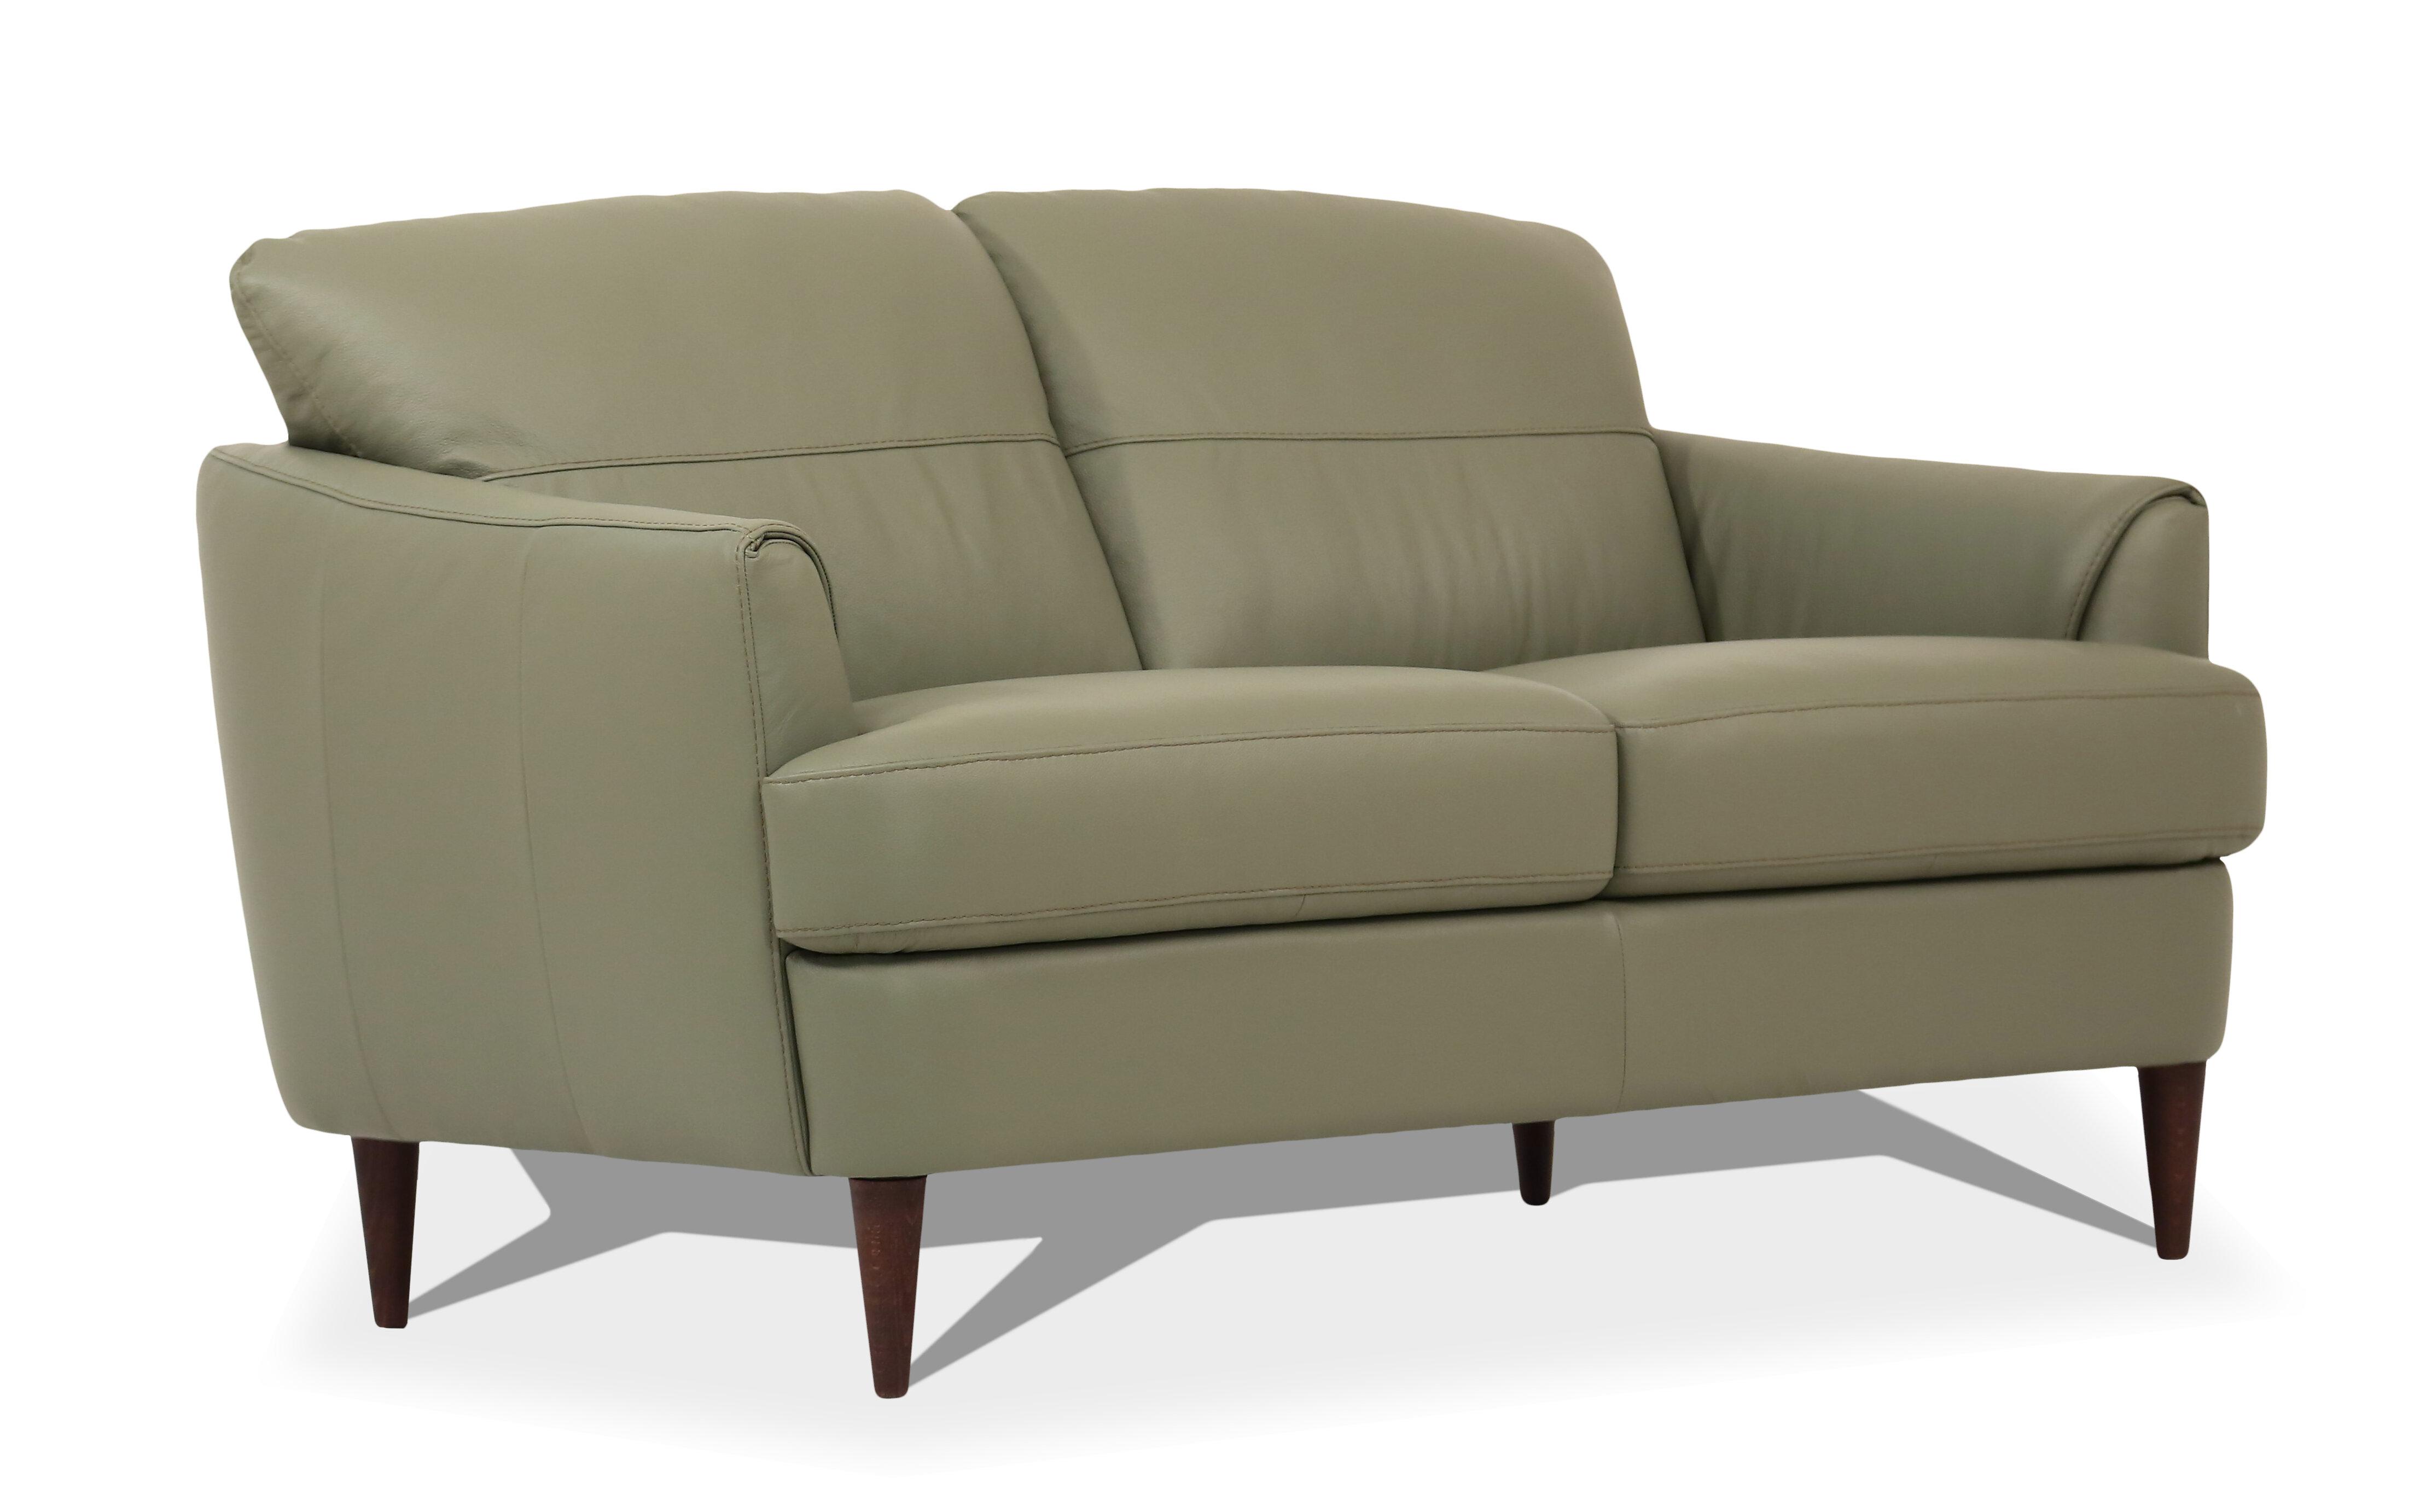 Enjoyable Bova Leather Loveseat Bralicious Painted Fabric Chair Ideas Braliciousco